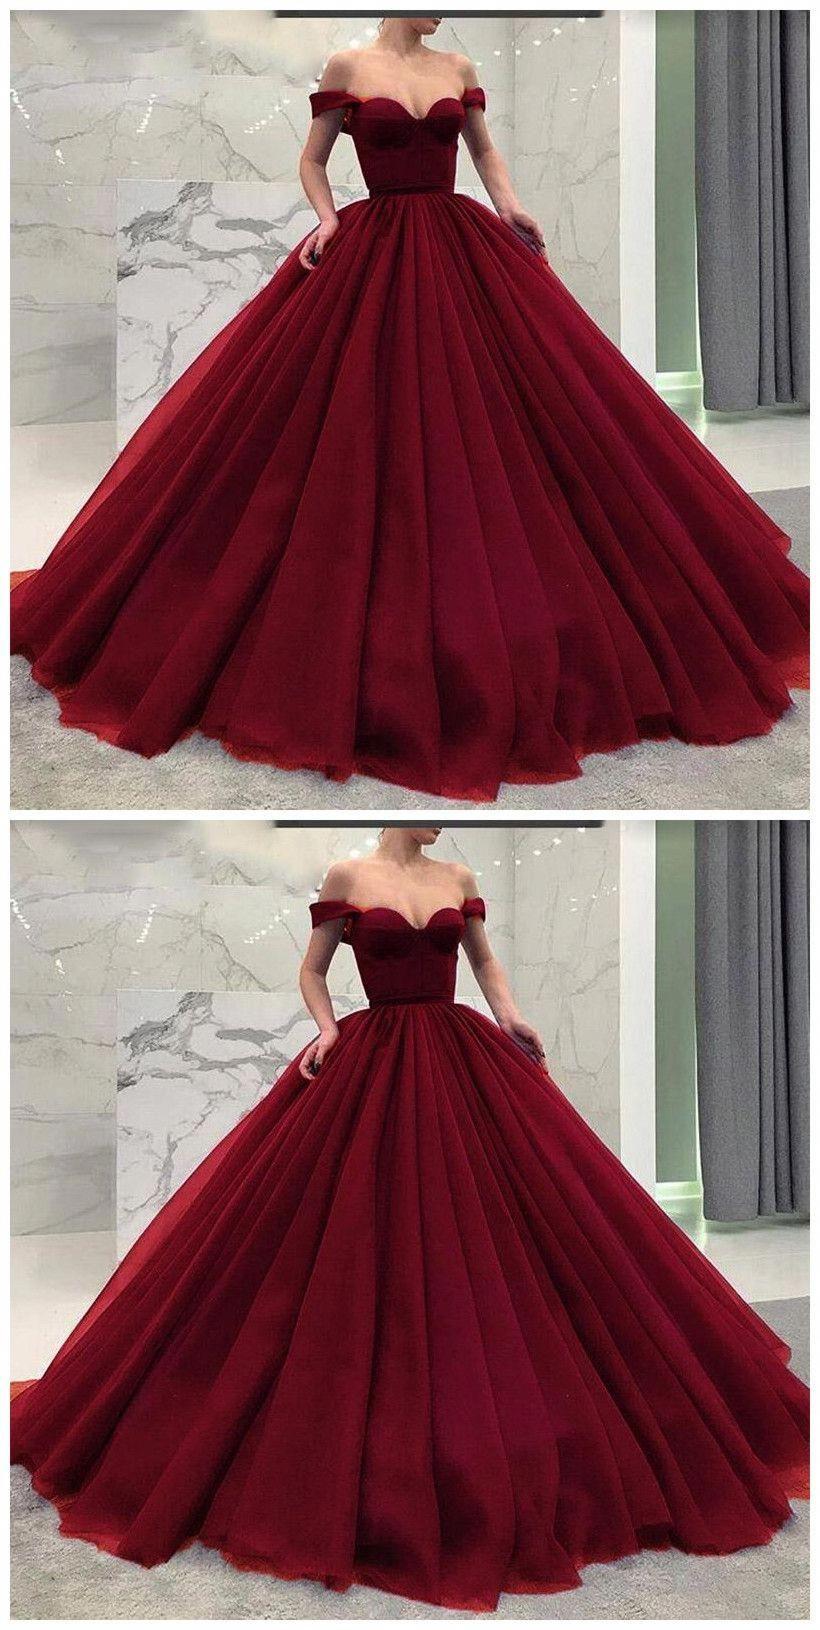 10f47f0d7d Inexpensive Wedding Dresses | Fashion Wedding Dress | Bridal Gown Online  Sale 20181027